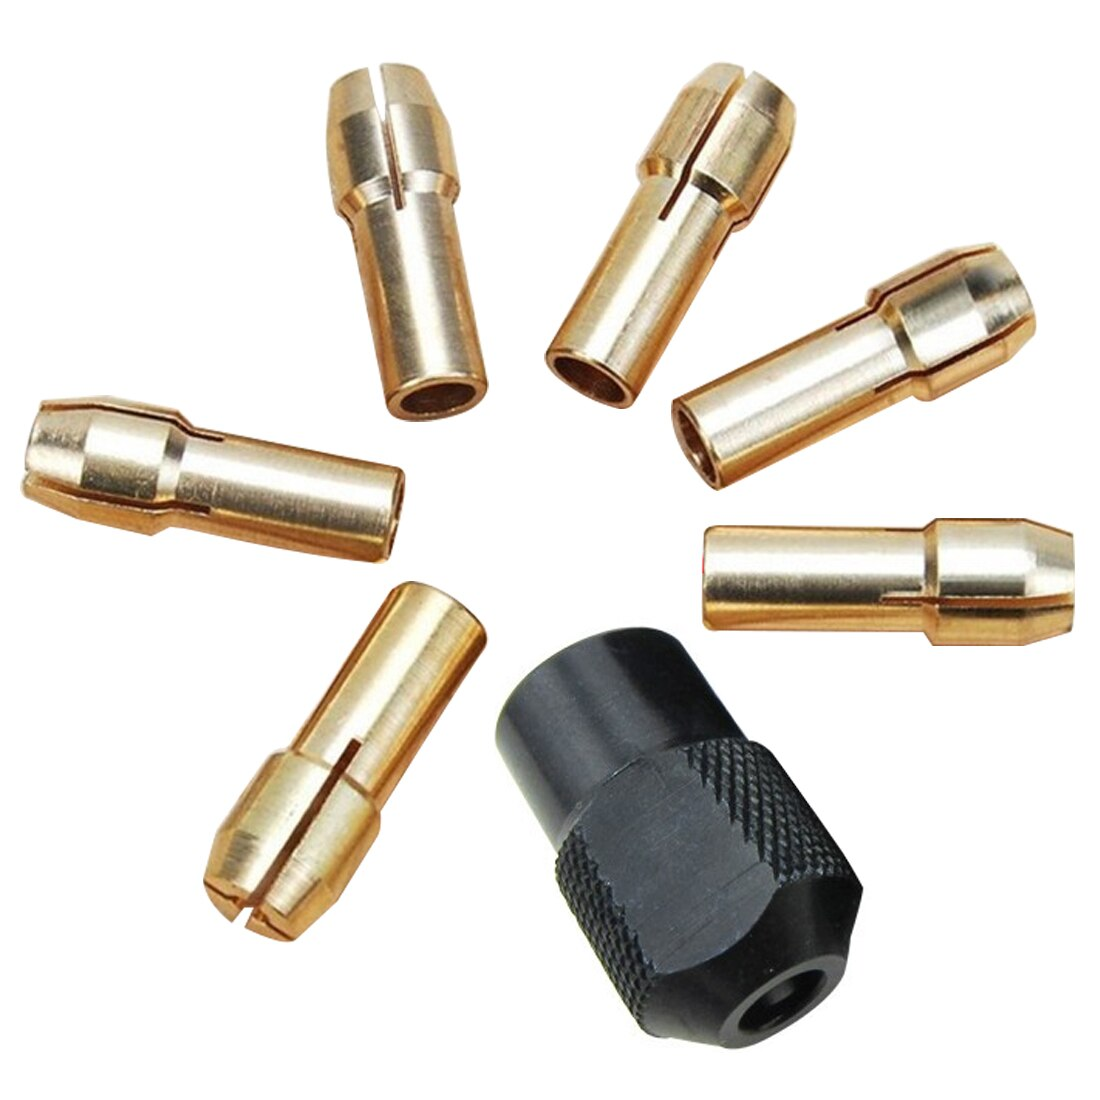 Mini portabrocas 7 Uds 1,0-3,2mm apto para Micro Twist Electronic dremel Drill Clamp Set Power Tool accesorios con llave